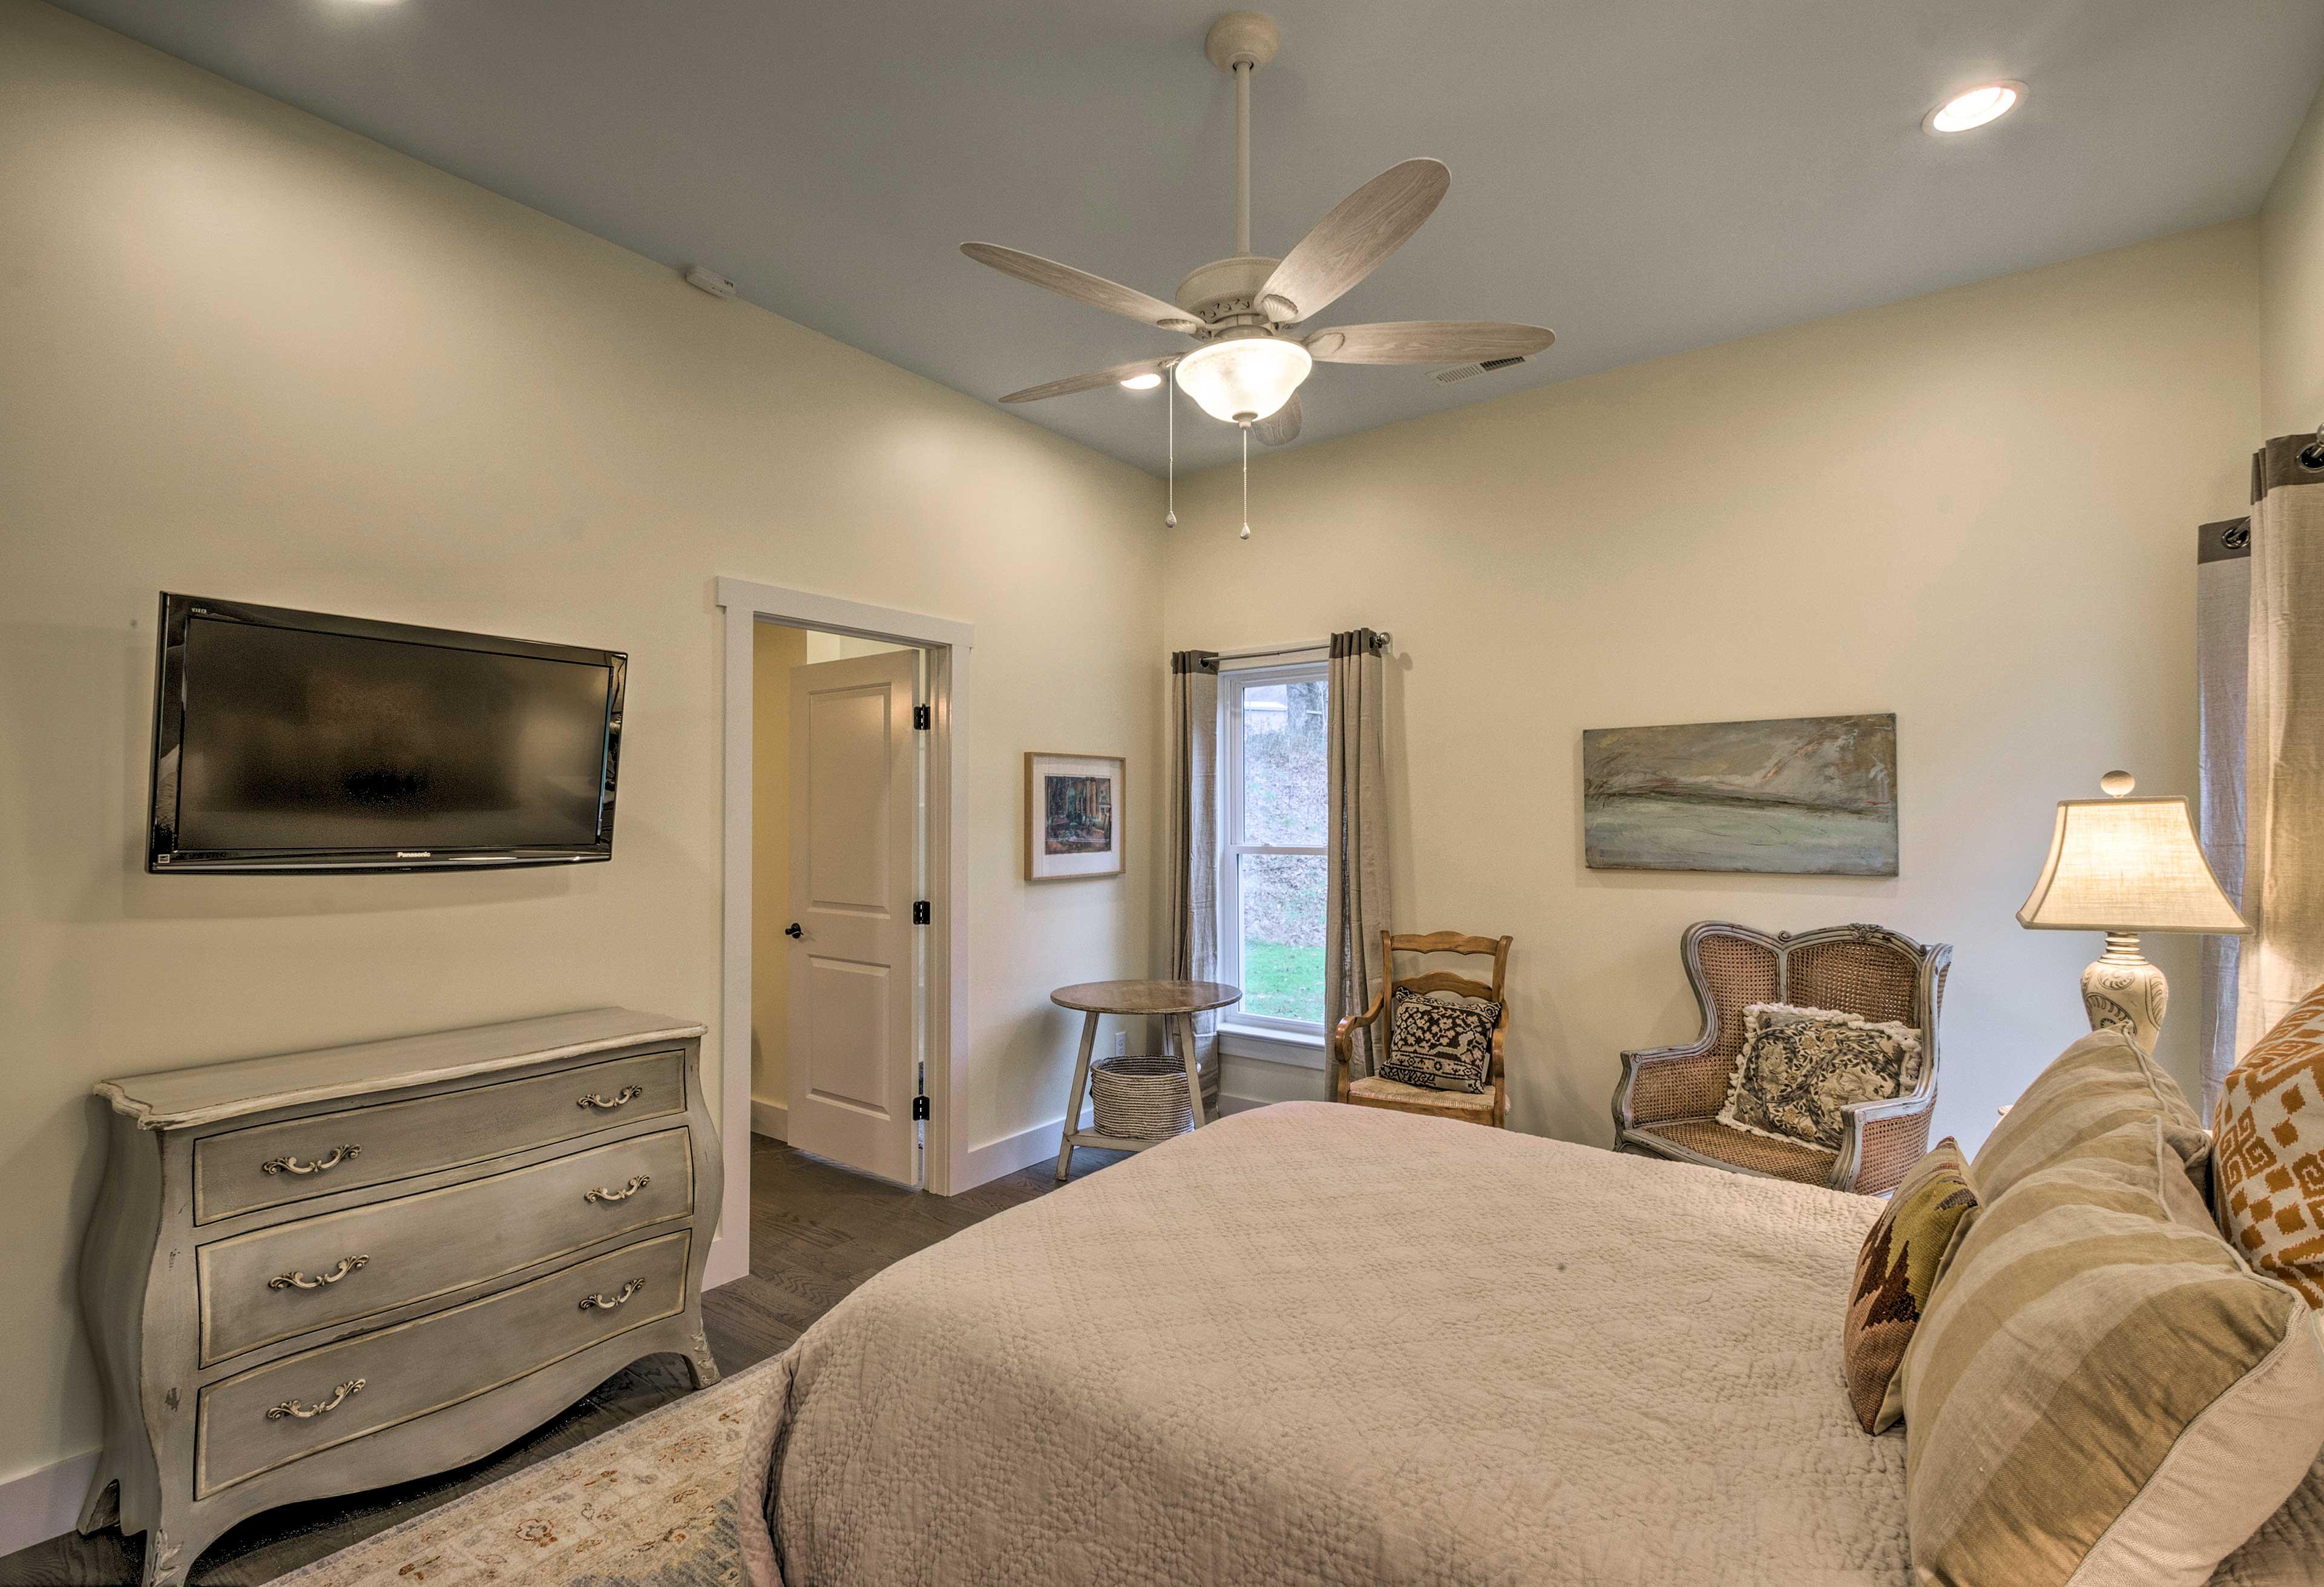 Each bedrooms includes a flat-screen Smart TV.